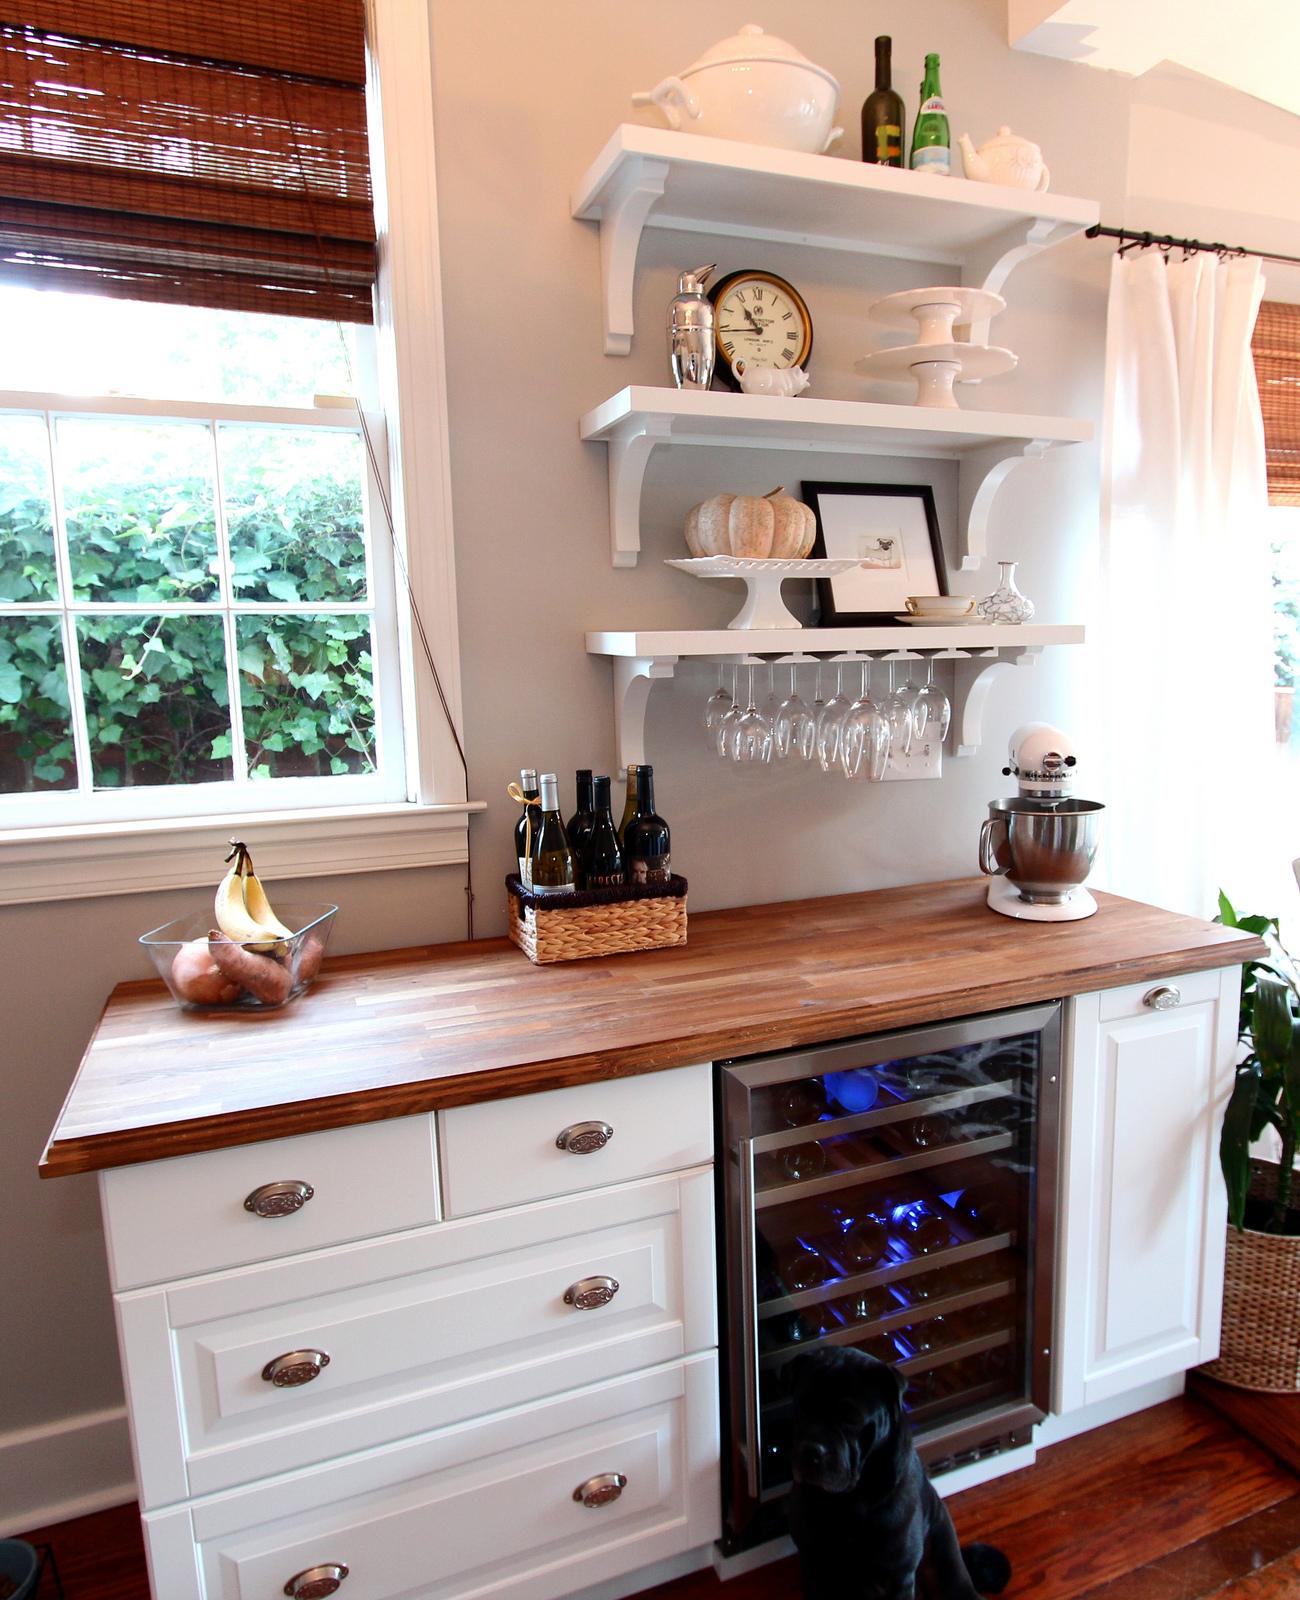 Wine Bar Ideas Home Decorating: NUMERAR + AKURUM + DIY = Chic Wine Bar